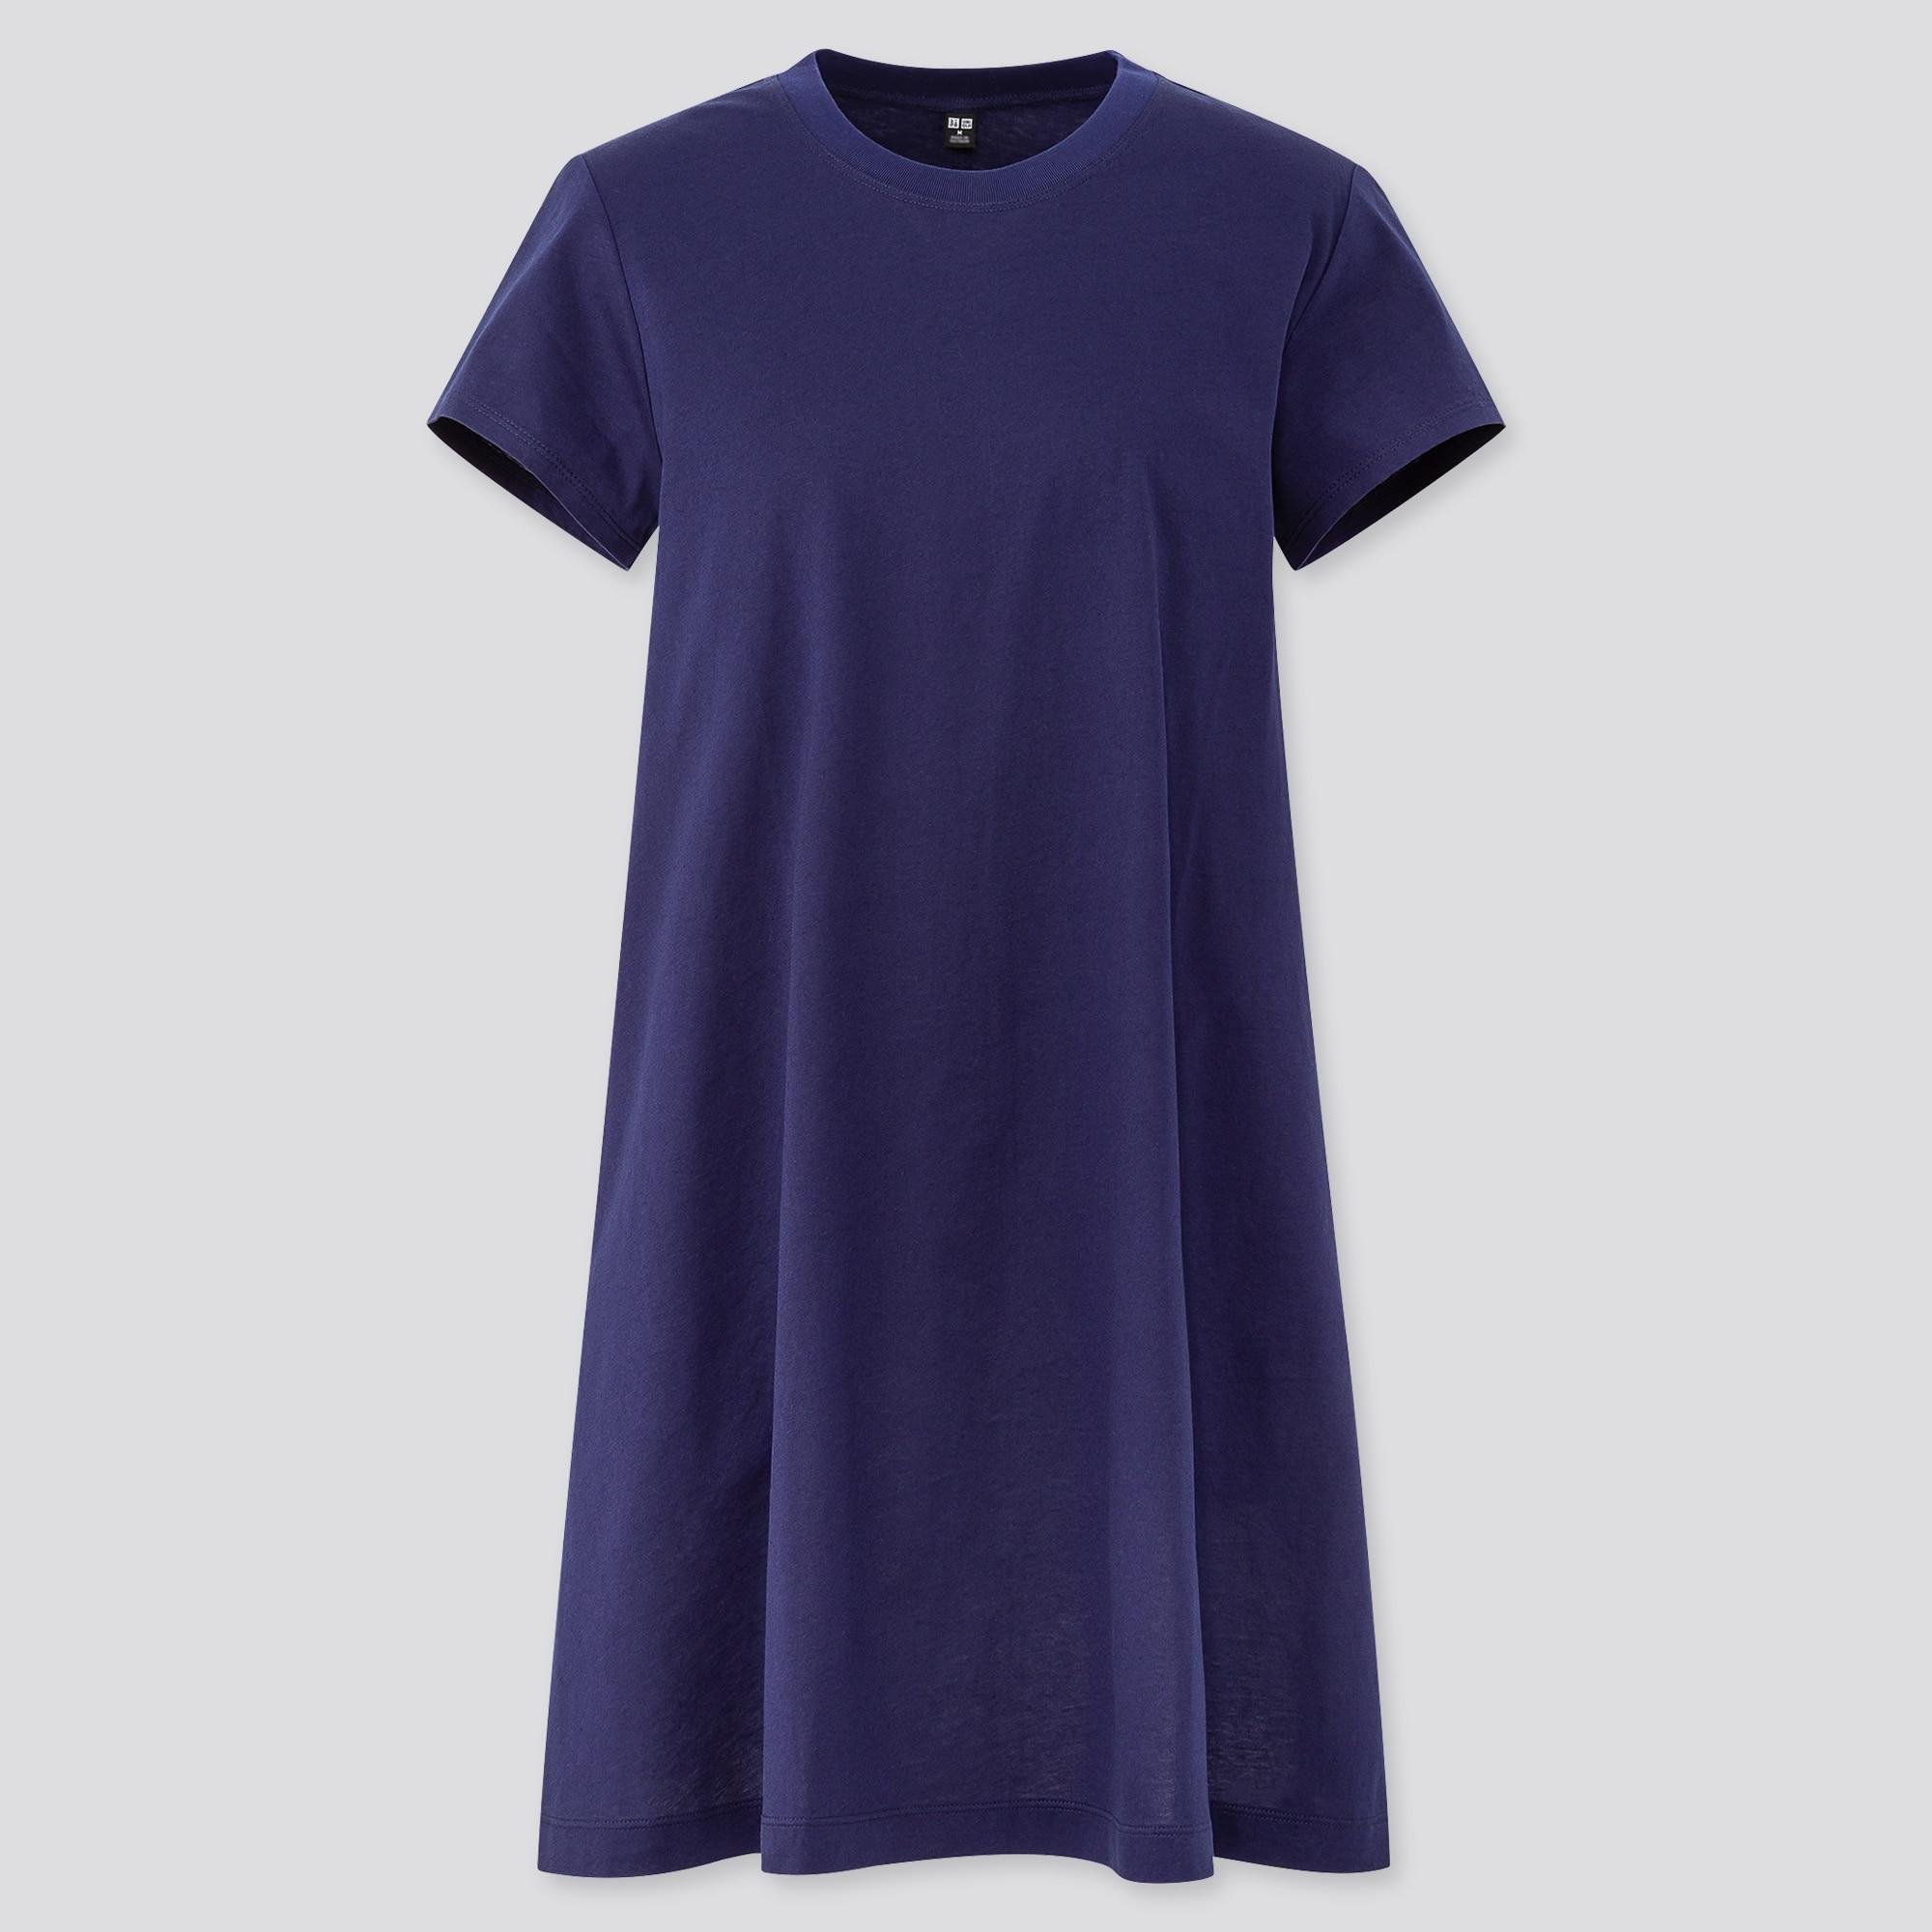 WOMEN MERCERIZED COTTON A-LINE MINI DRESS